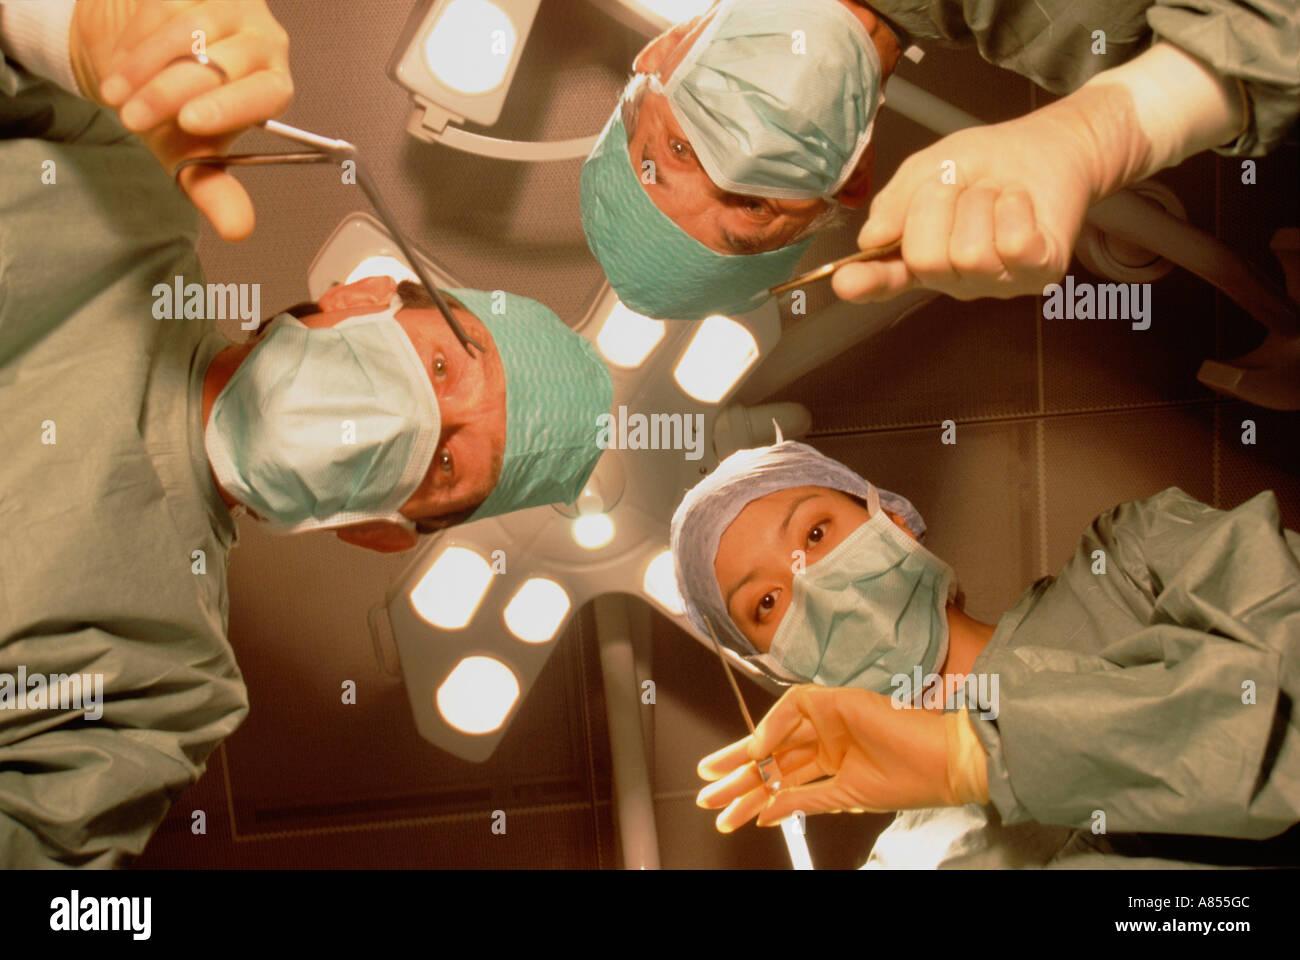 Surgery Operation Hospital Uk Stock Photos & Surgery